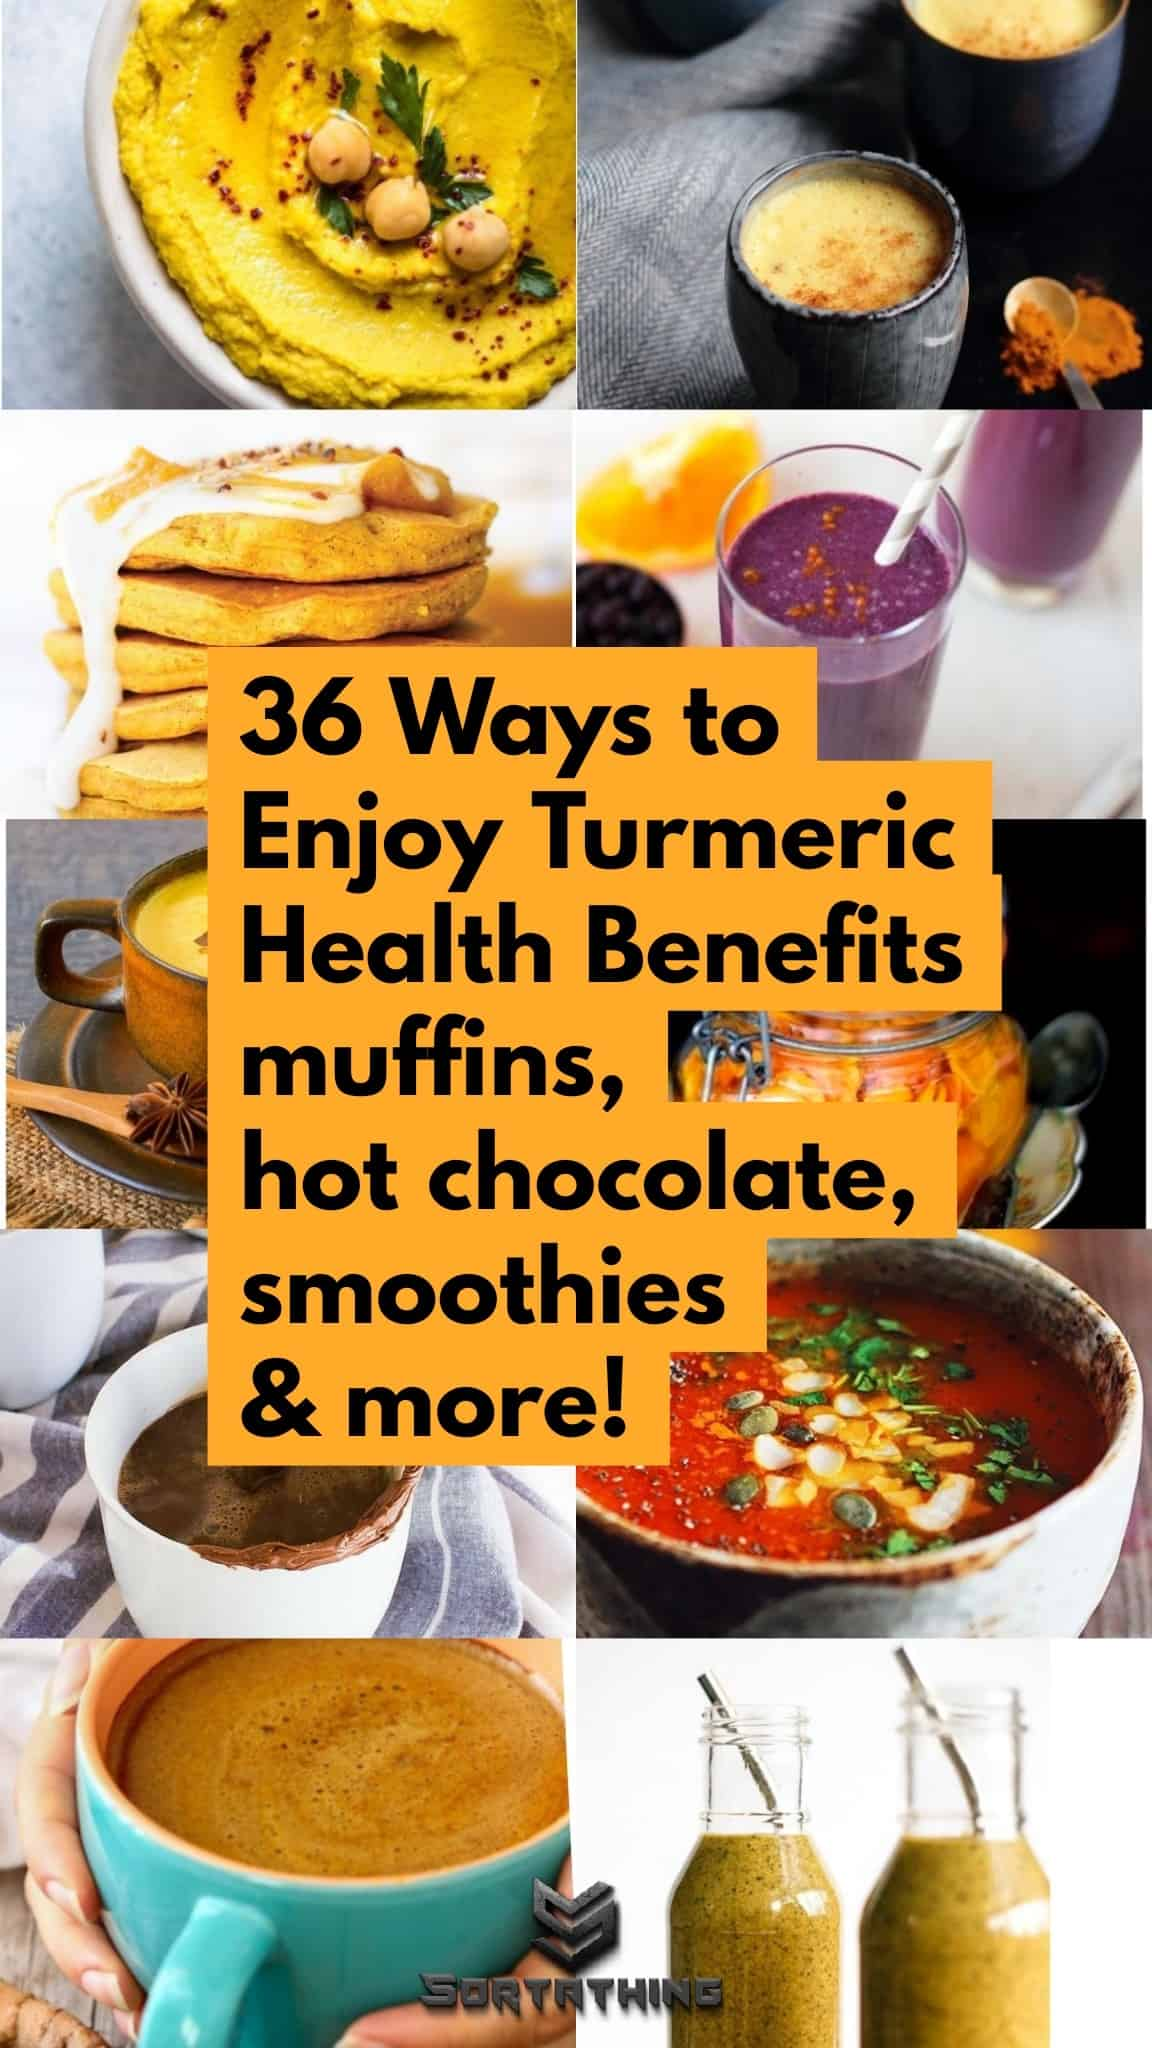 Turmeric Recipes - 36 Ways to Enjoy Turmeric Benefits